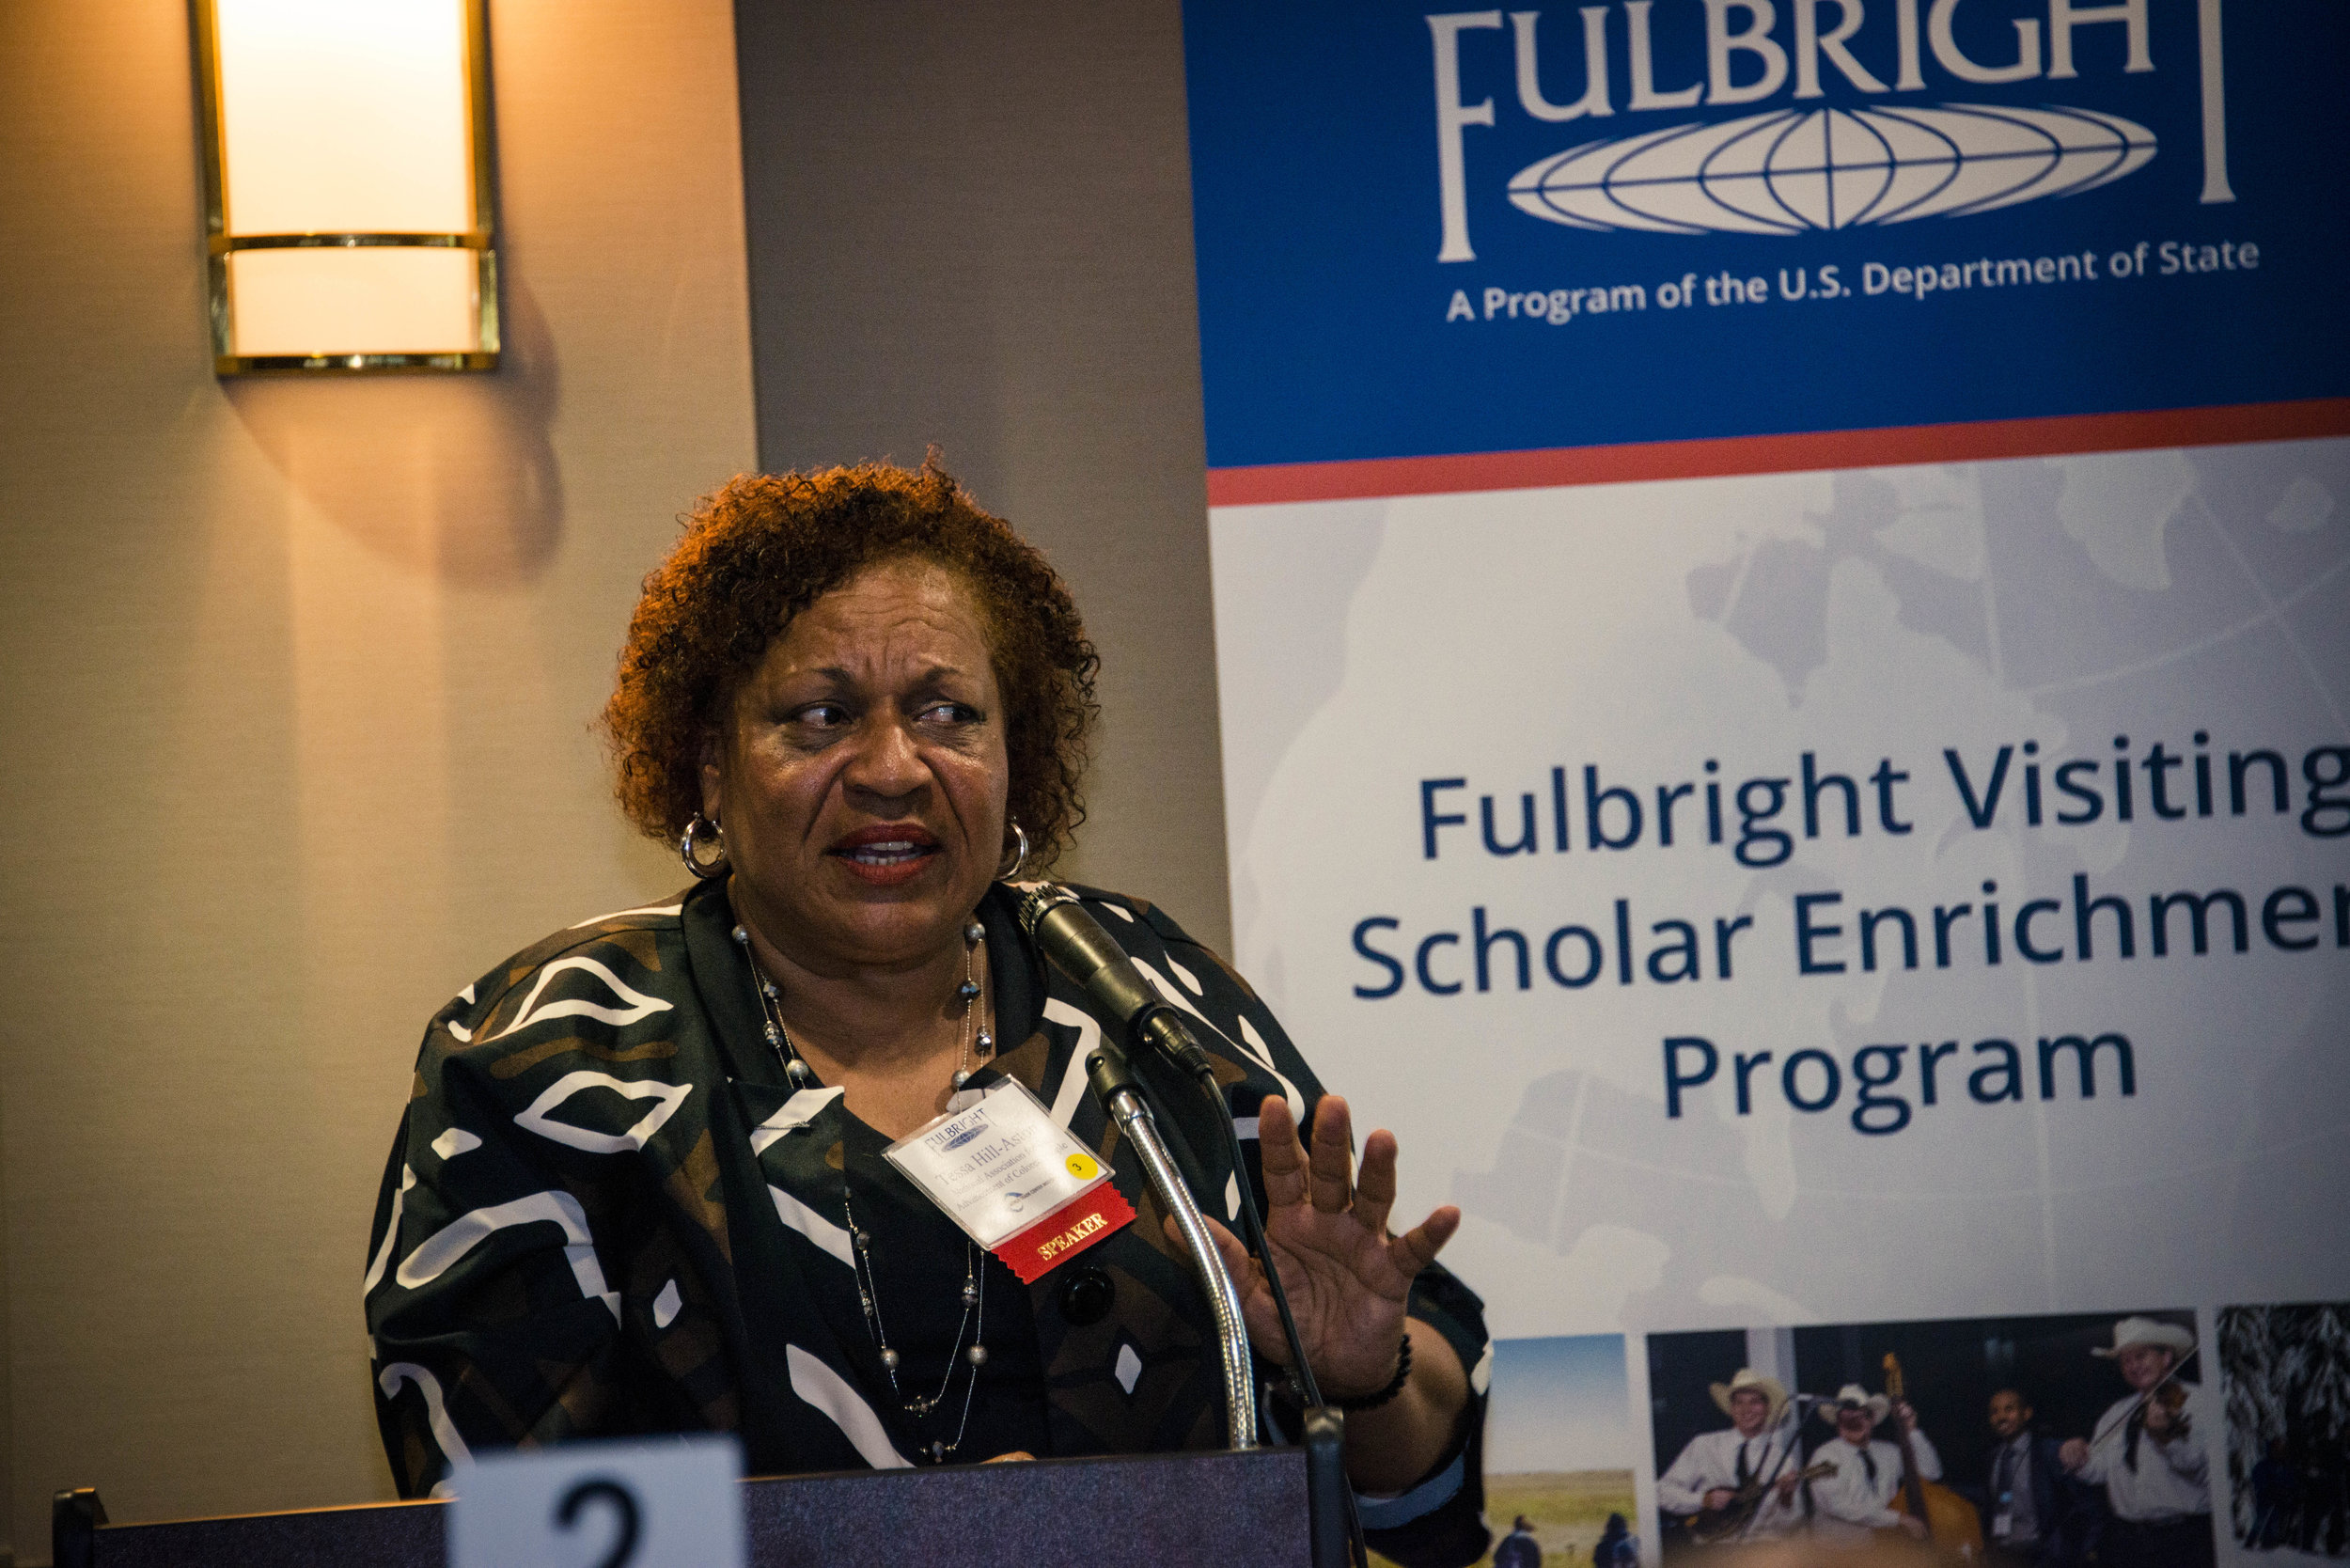 fulbright-81.jpg